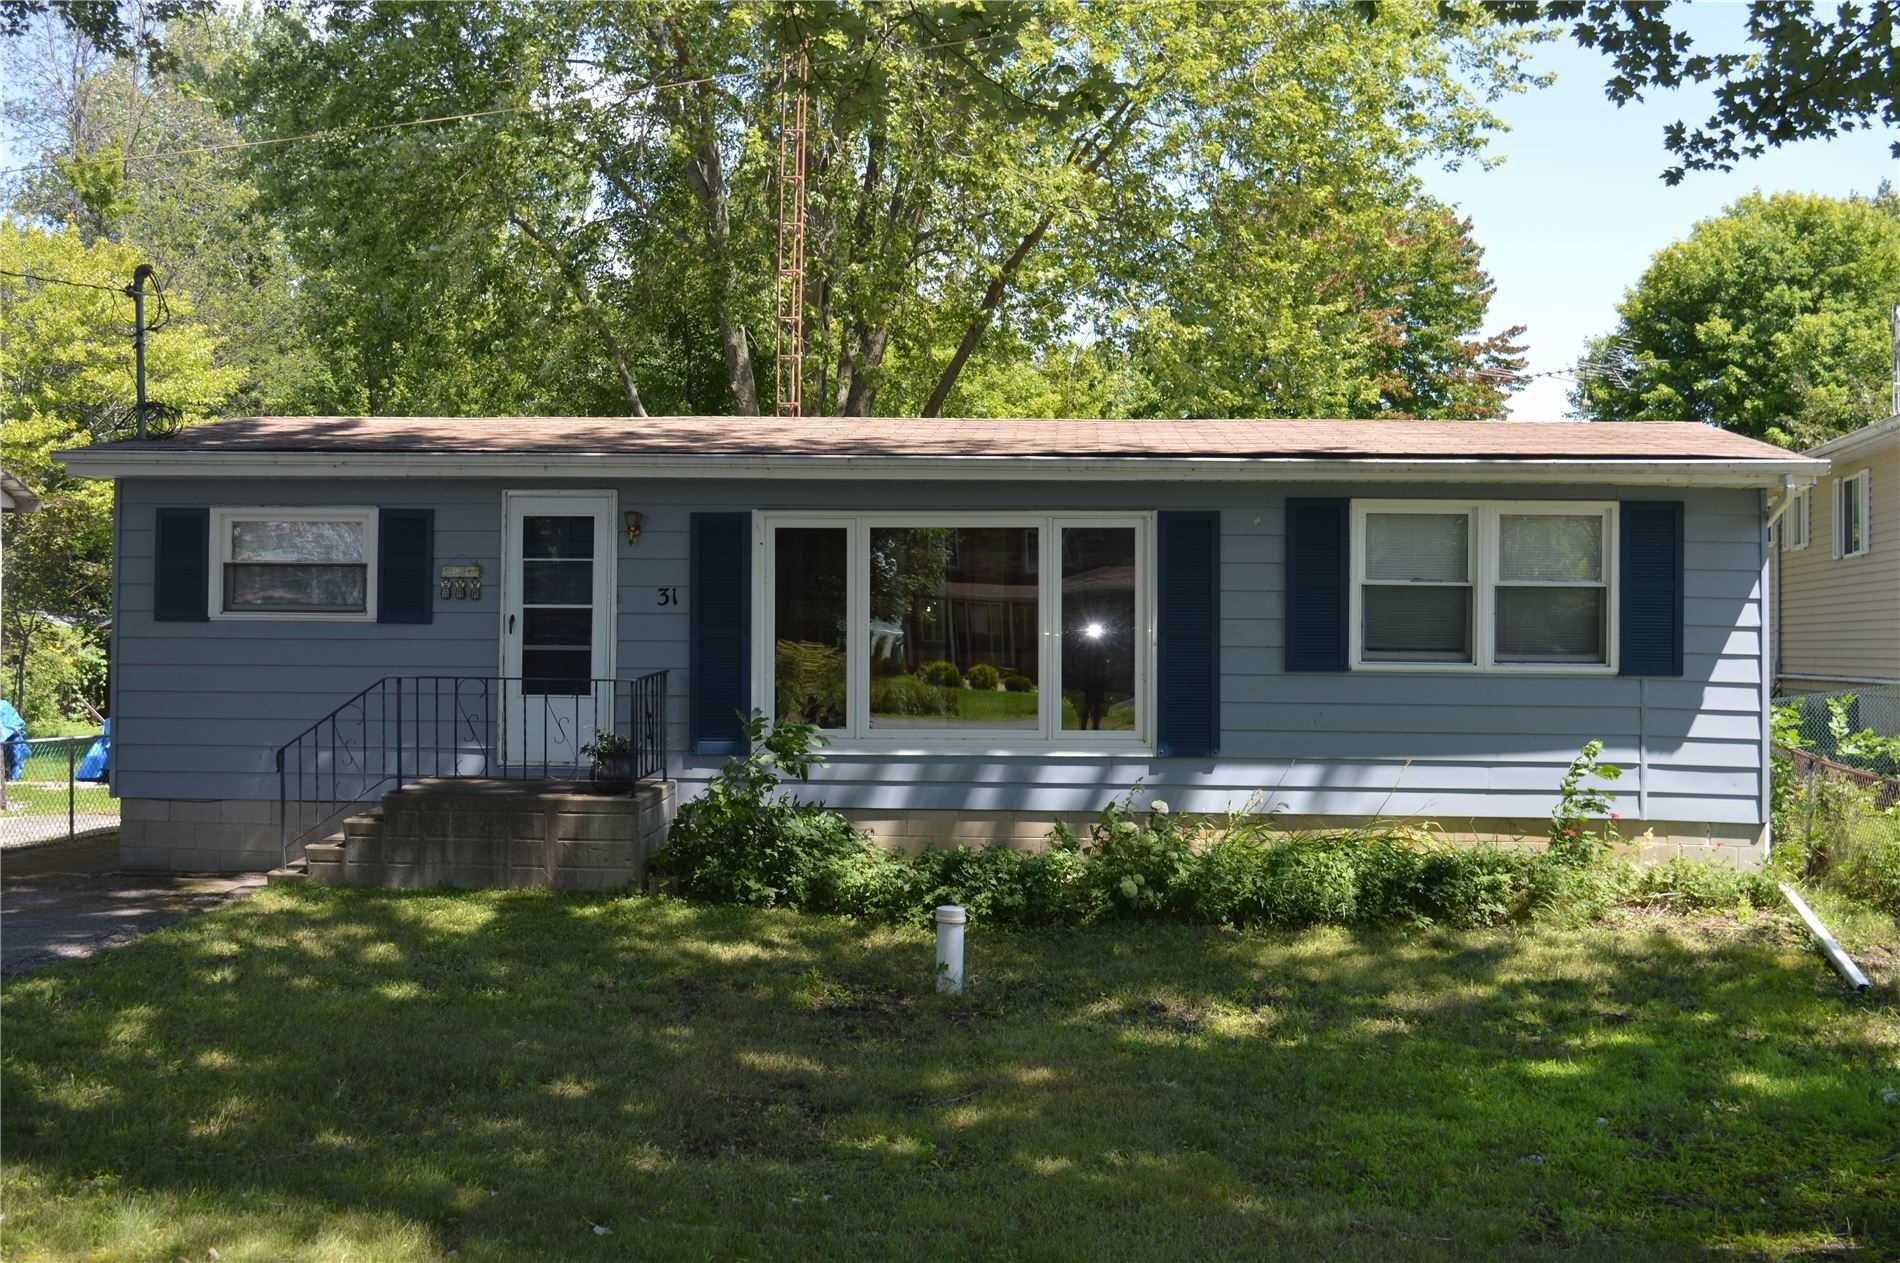 Main Photo: 31 Lake Avenue in Ramara: Brechin House (Bungalow) for sale : MLS®# S4857919